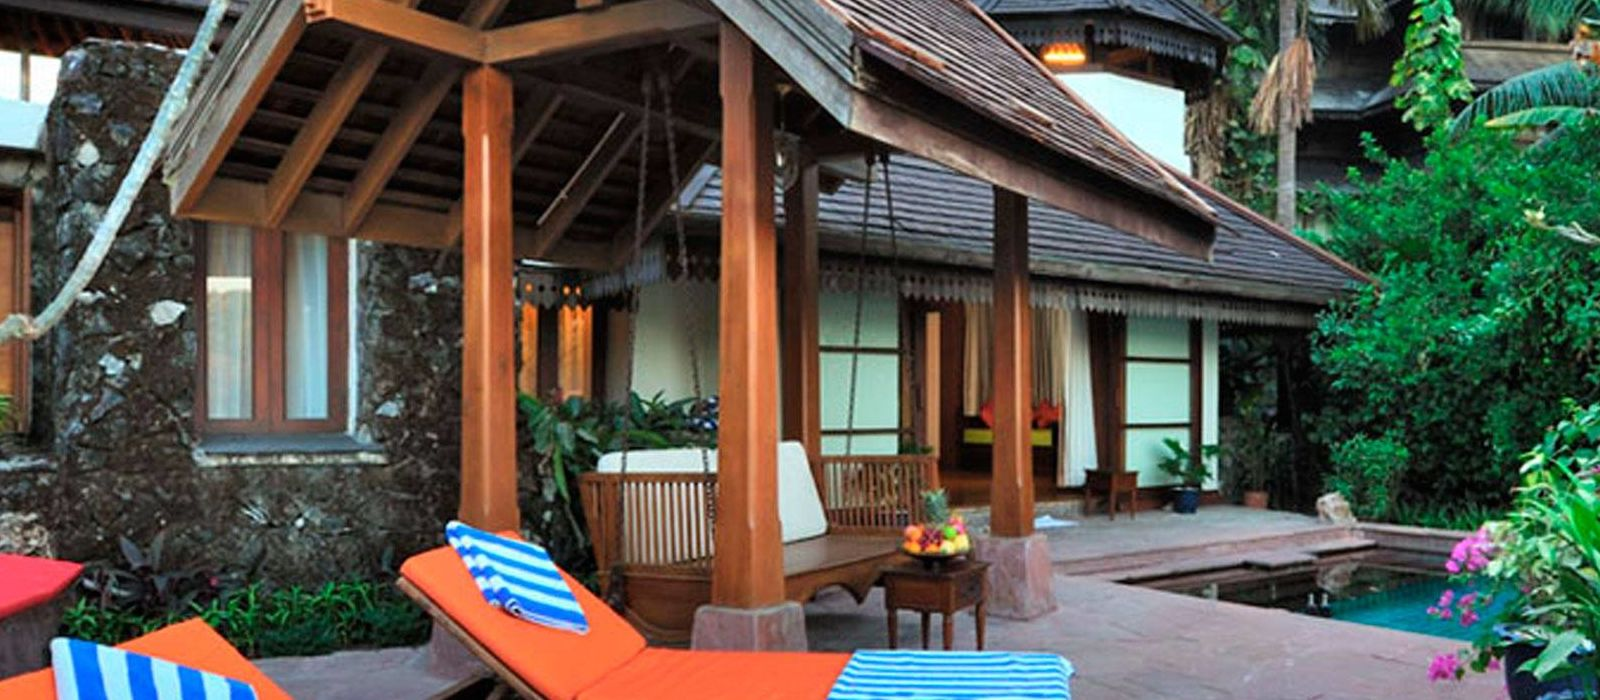 Hotel Kandawgyi Palace (Yangon) Myanmar